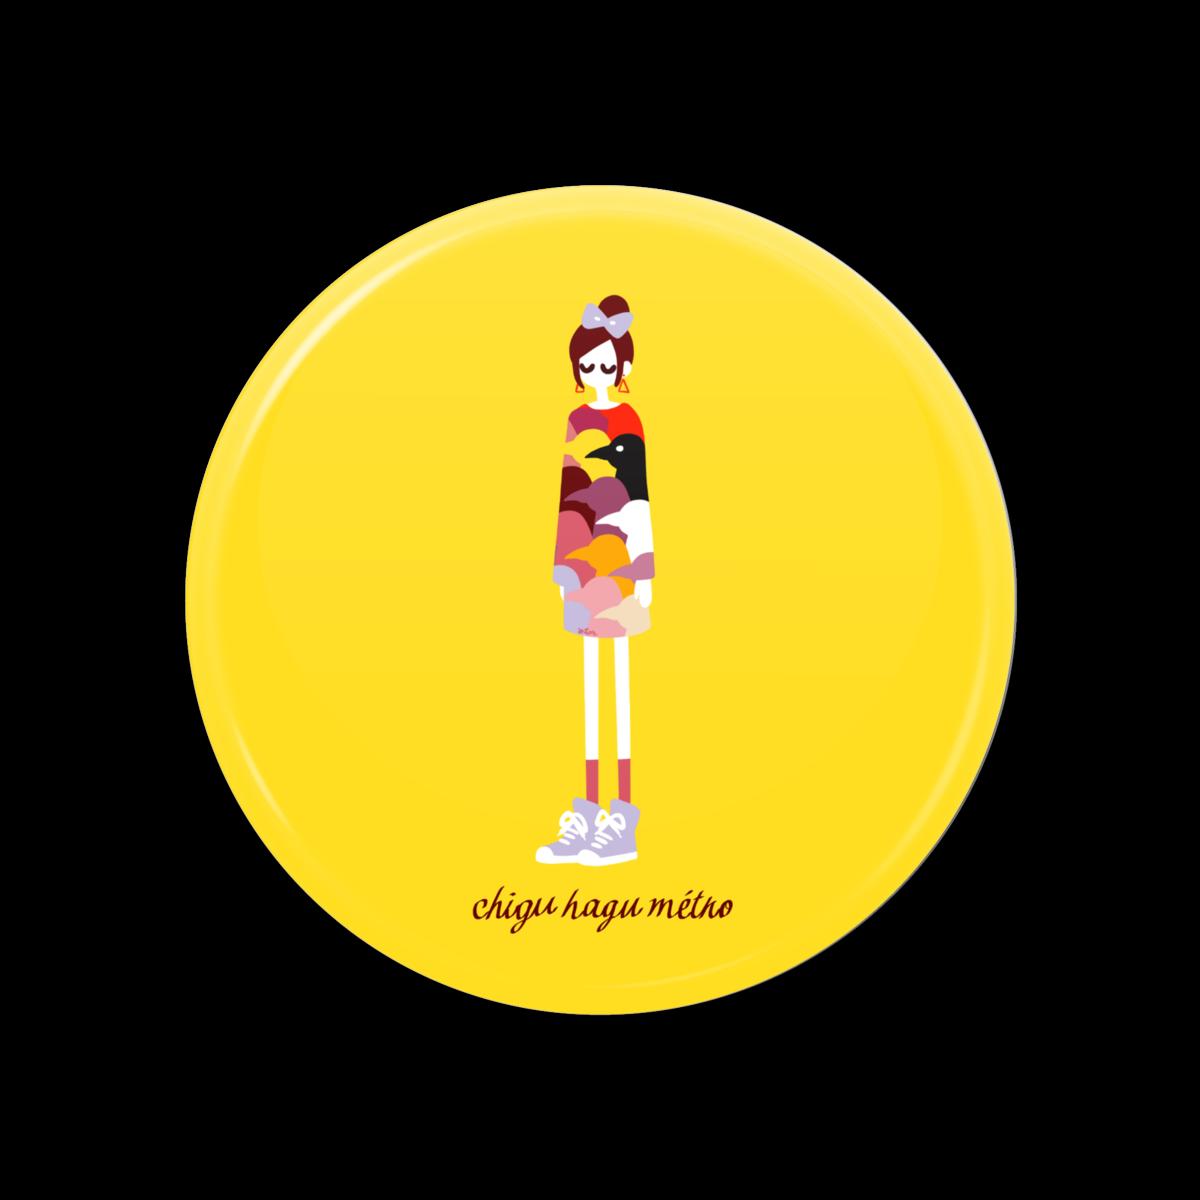 f:id:chiguhagu_metro:20210211134832p:plain